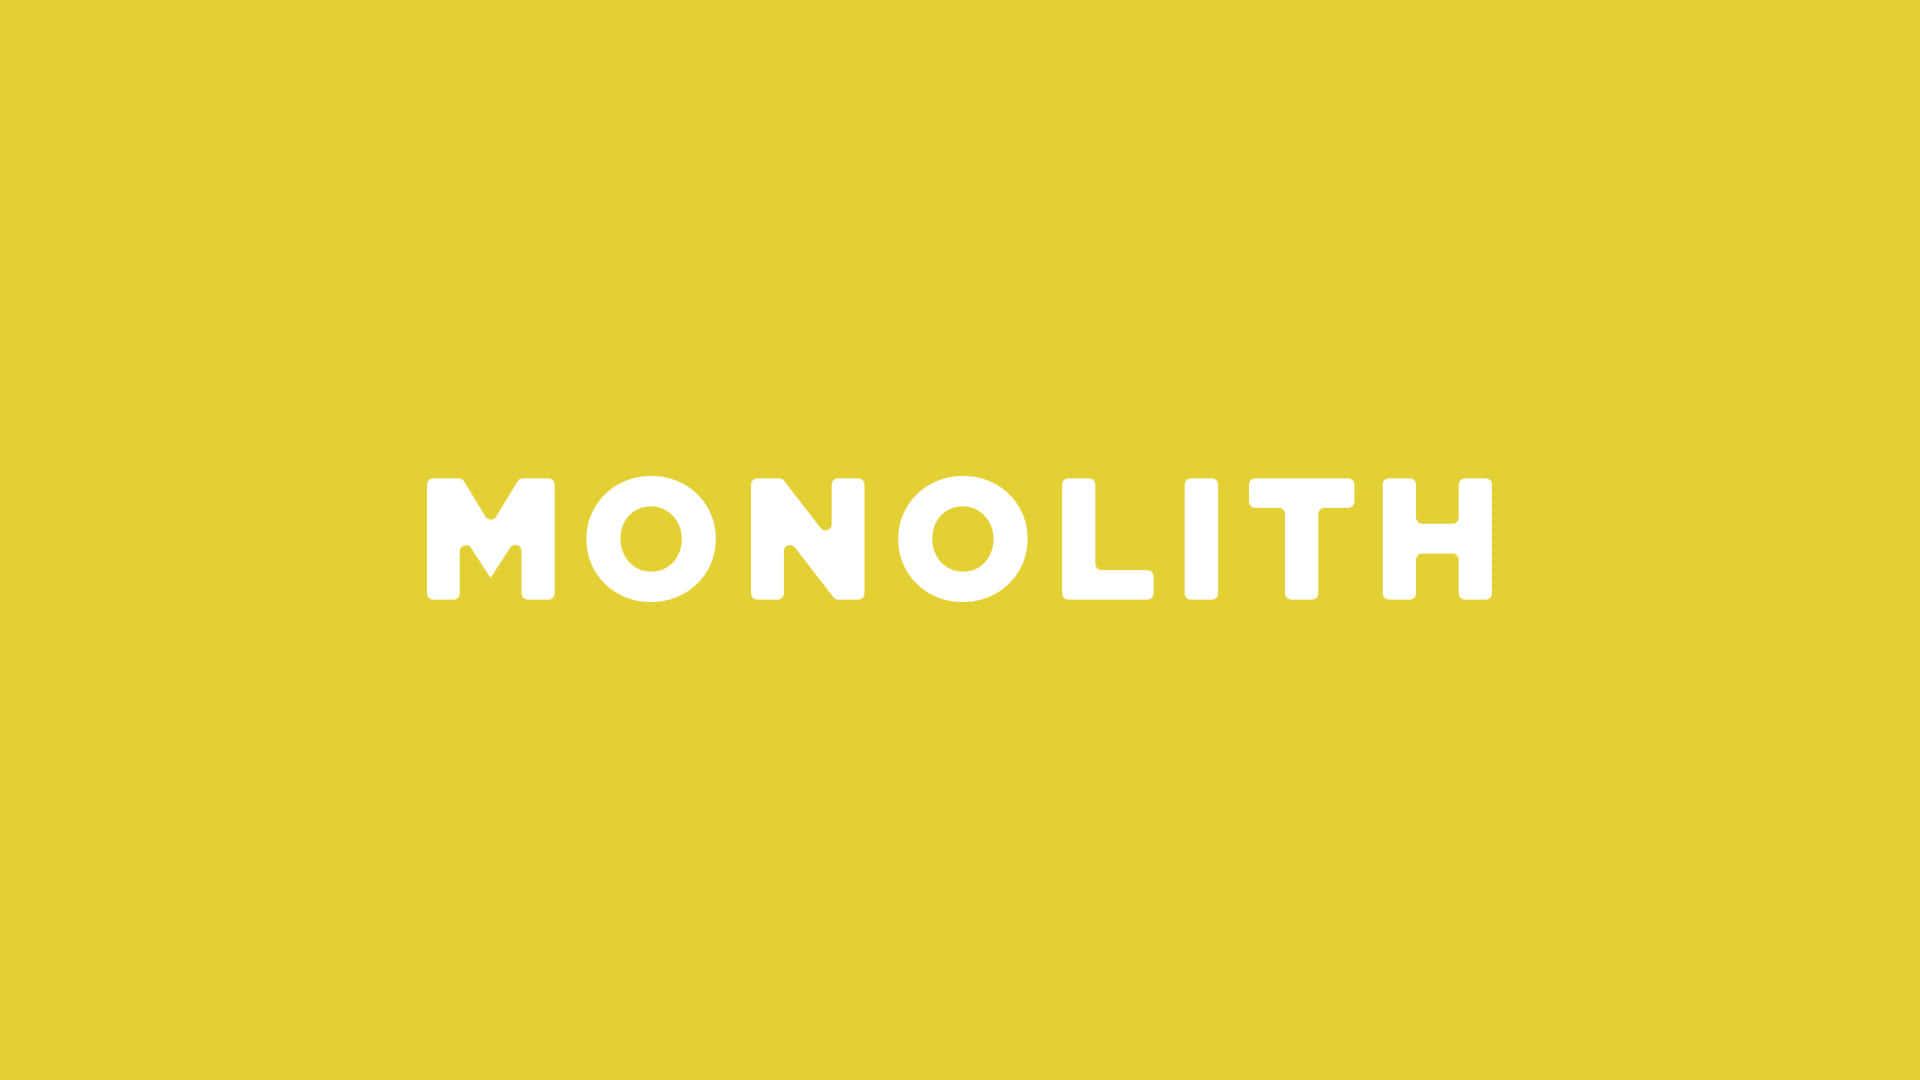 monolith-6-full